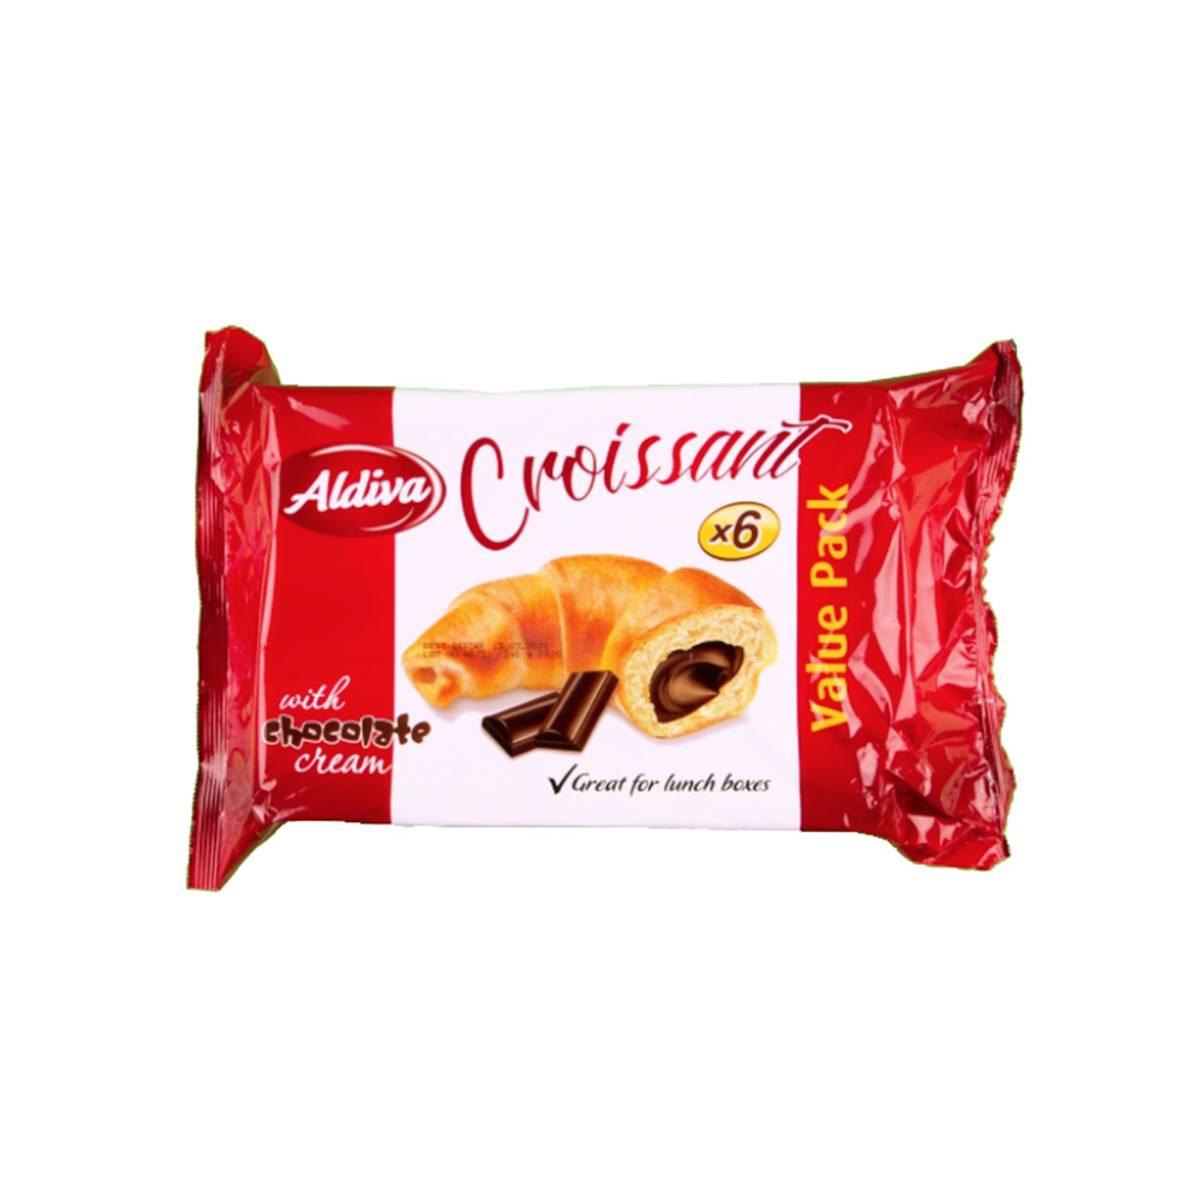 Chocolate Croissants 6pk